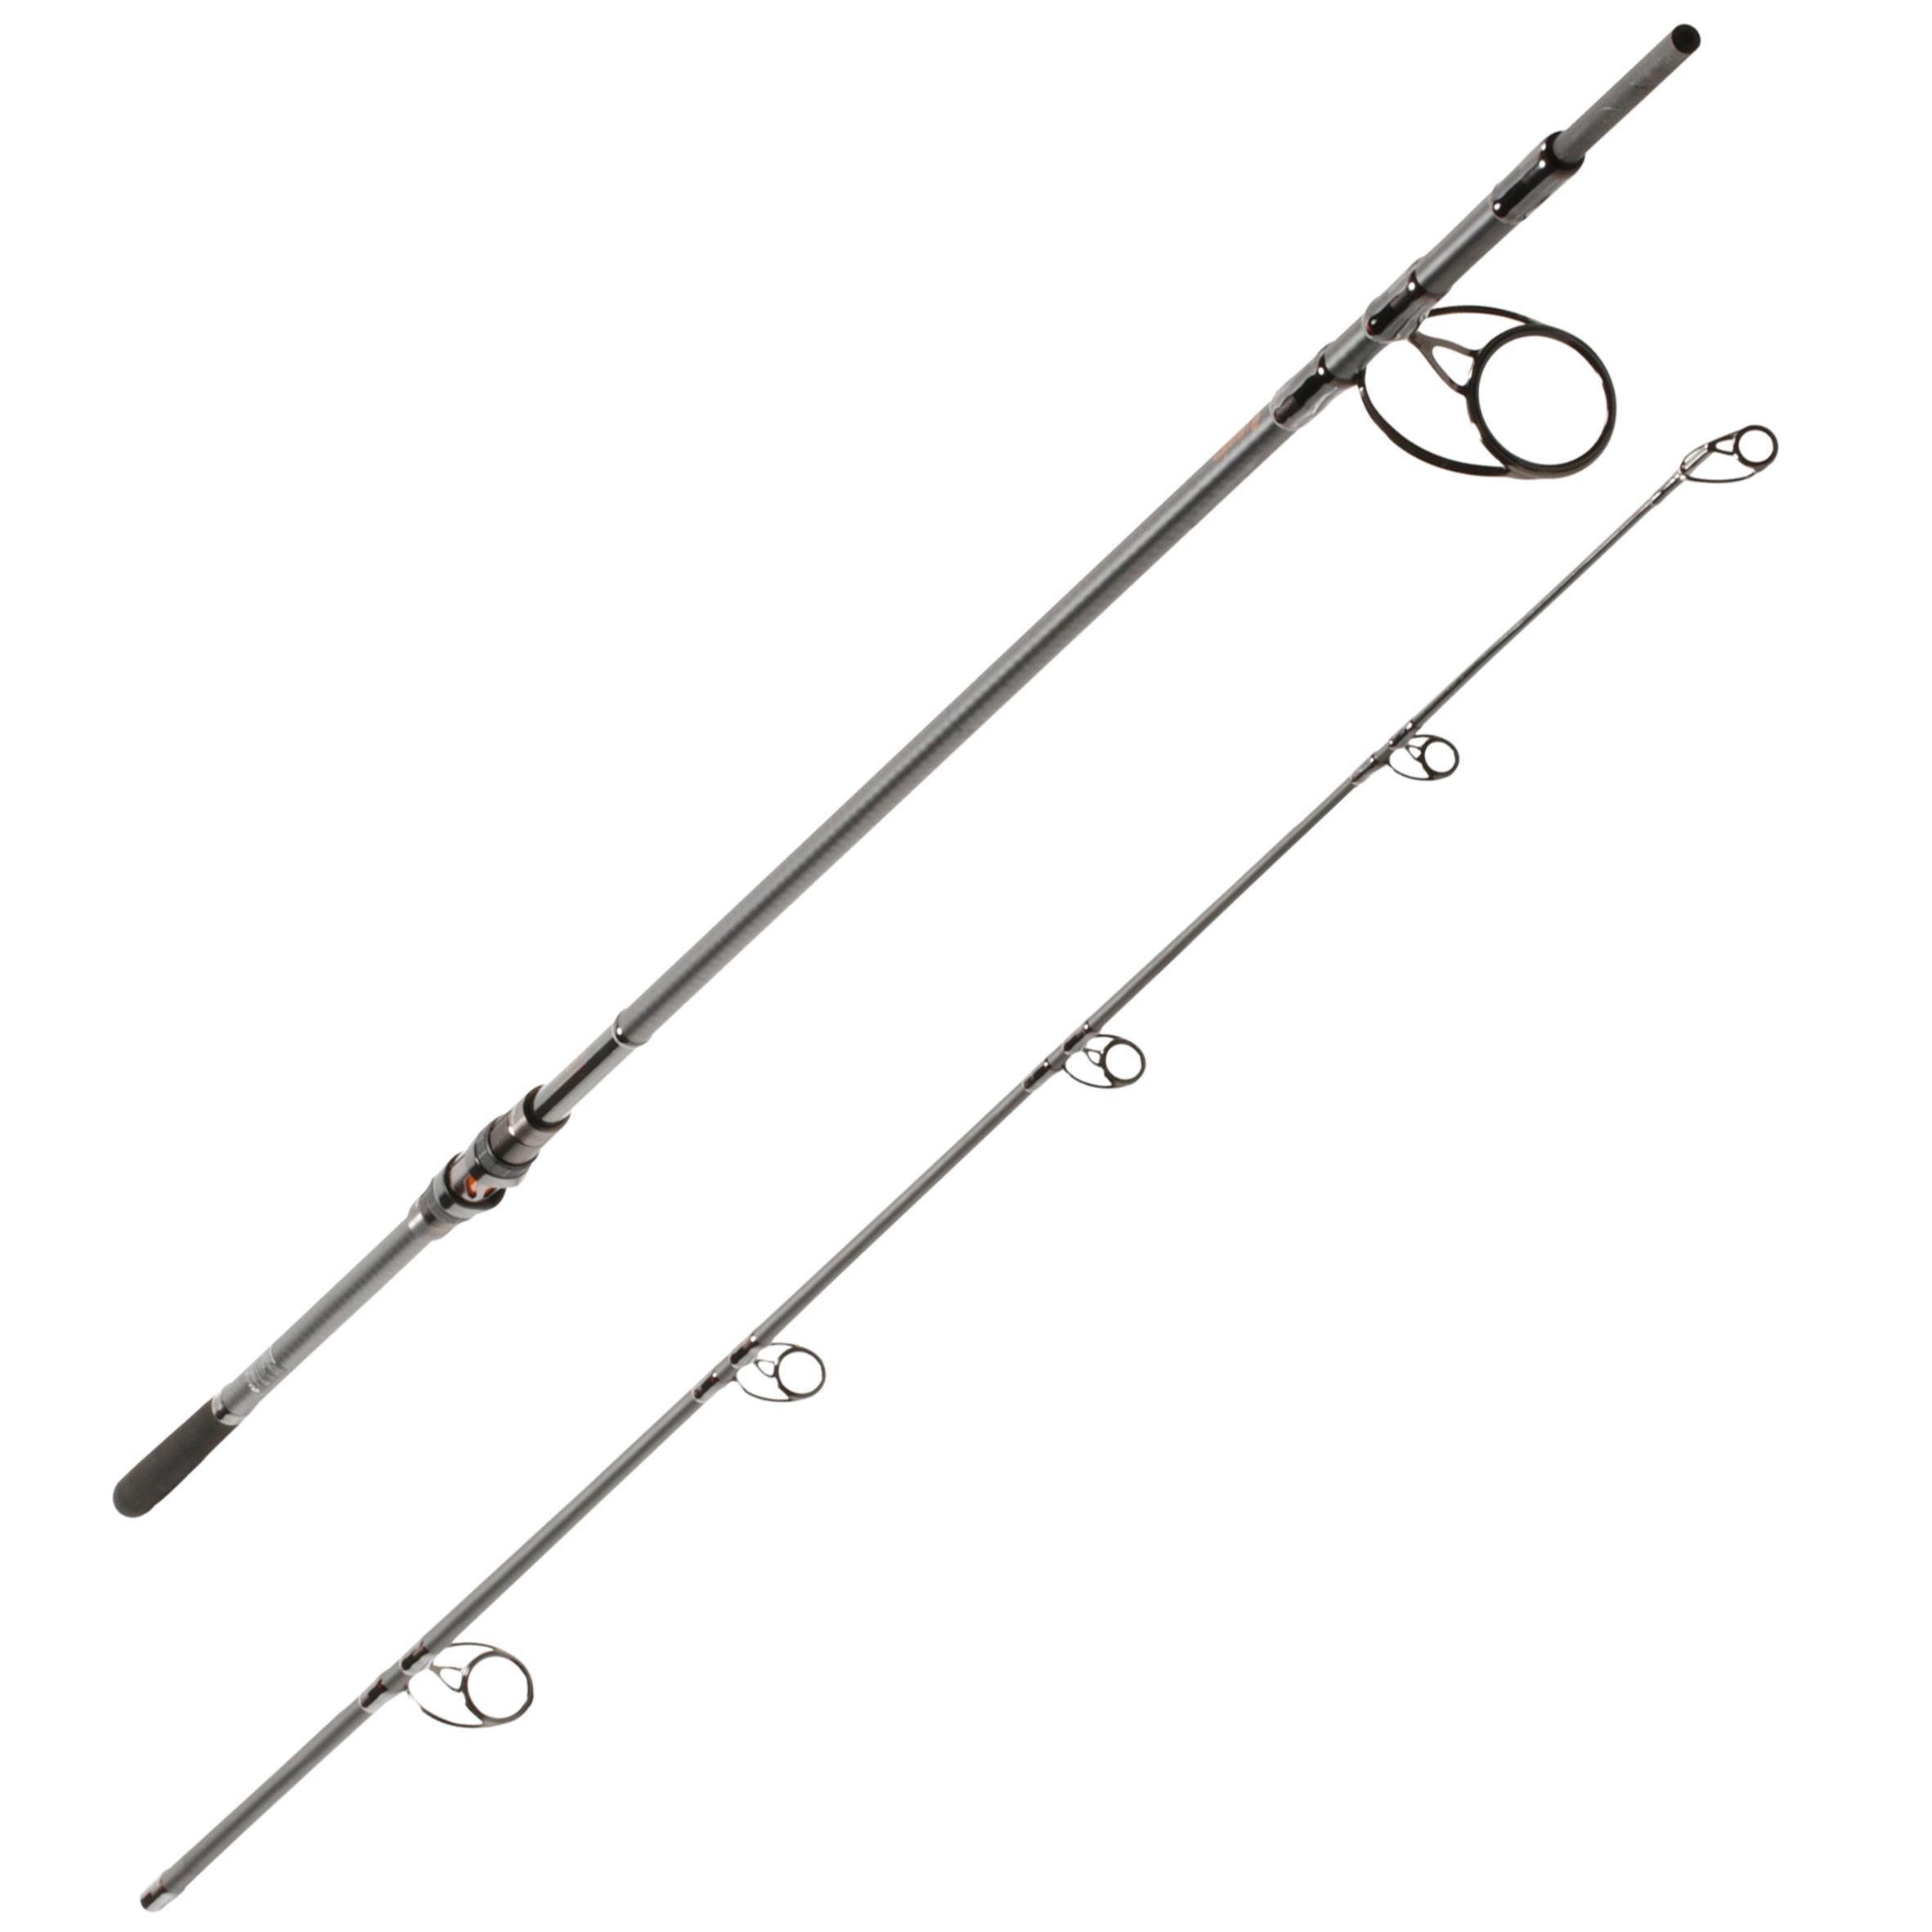 XTREM-9 390 Carp Fishing Rod